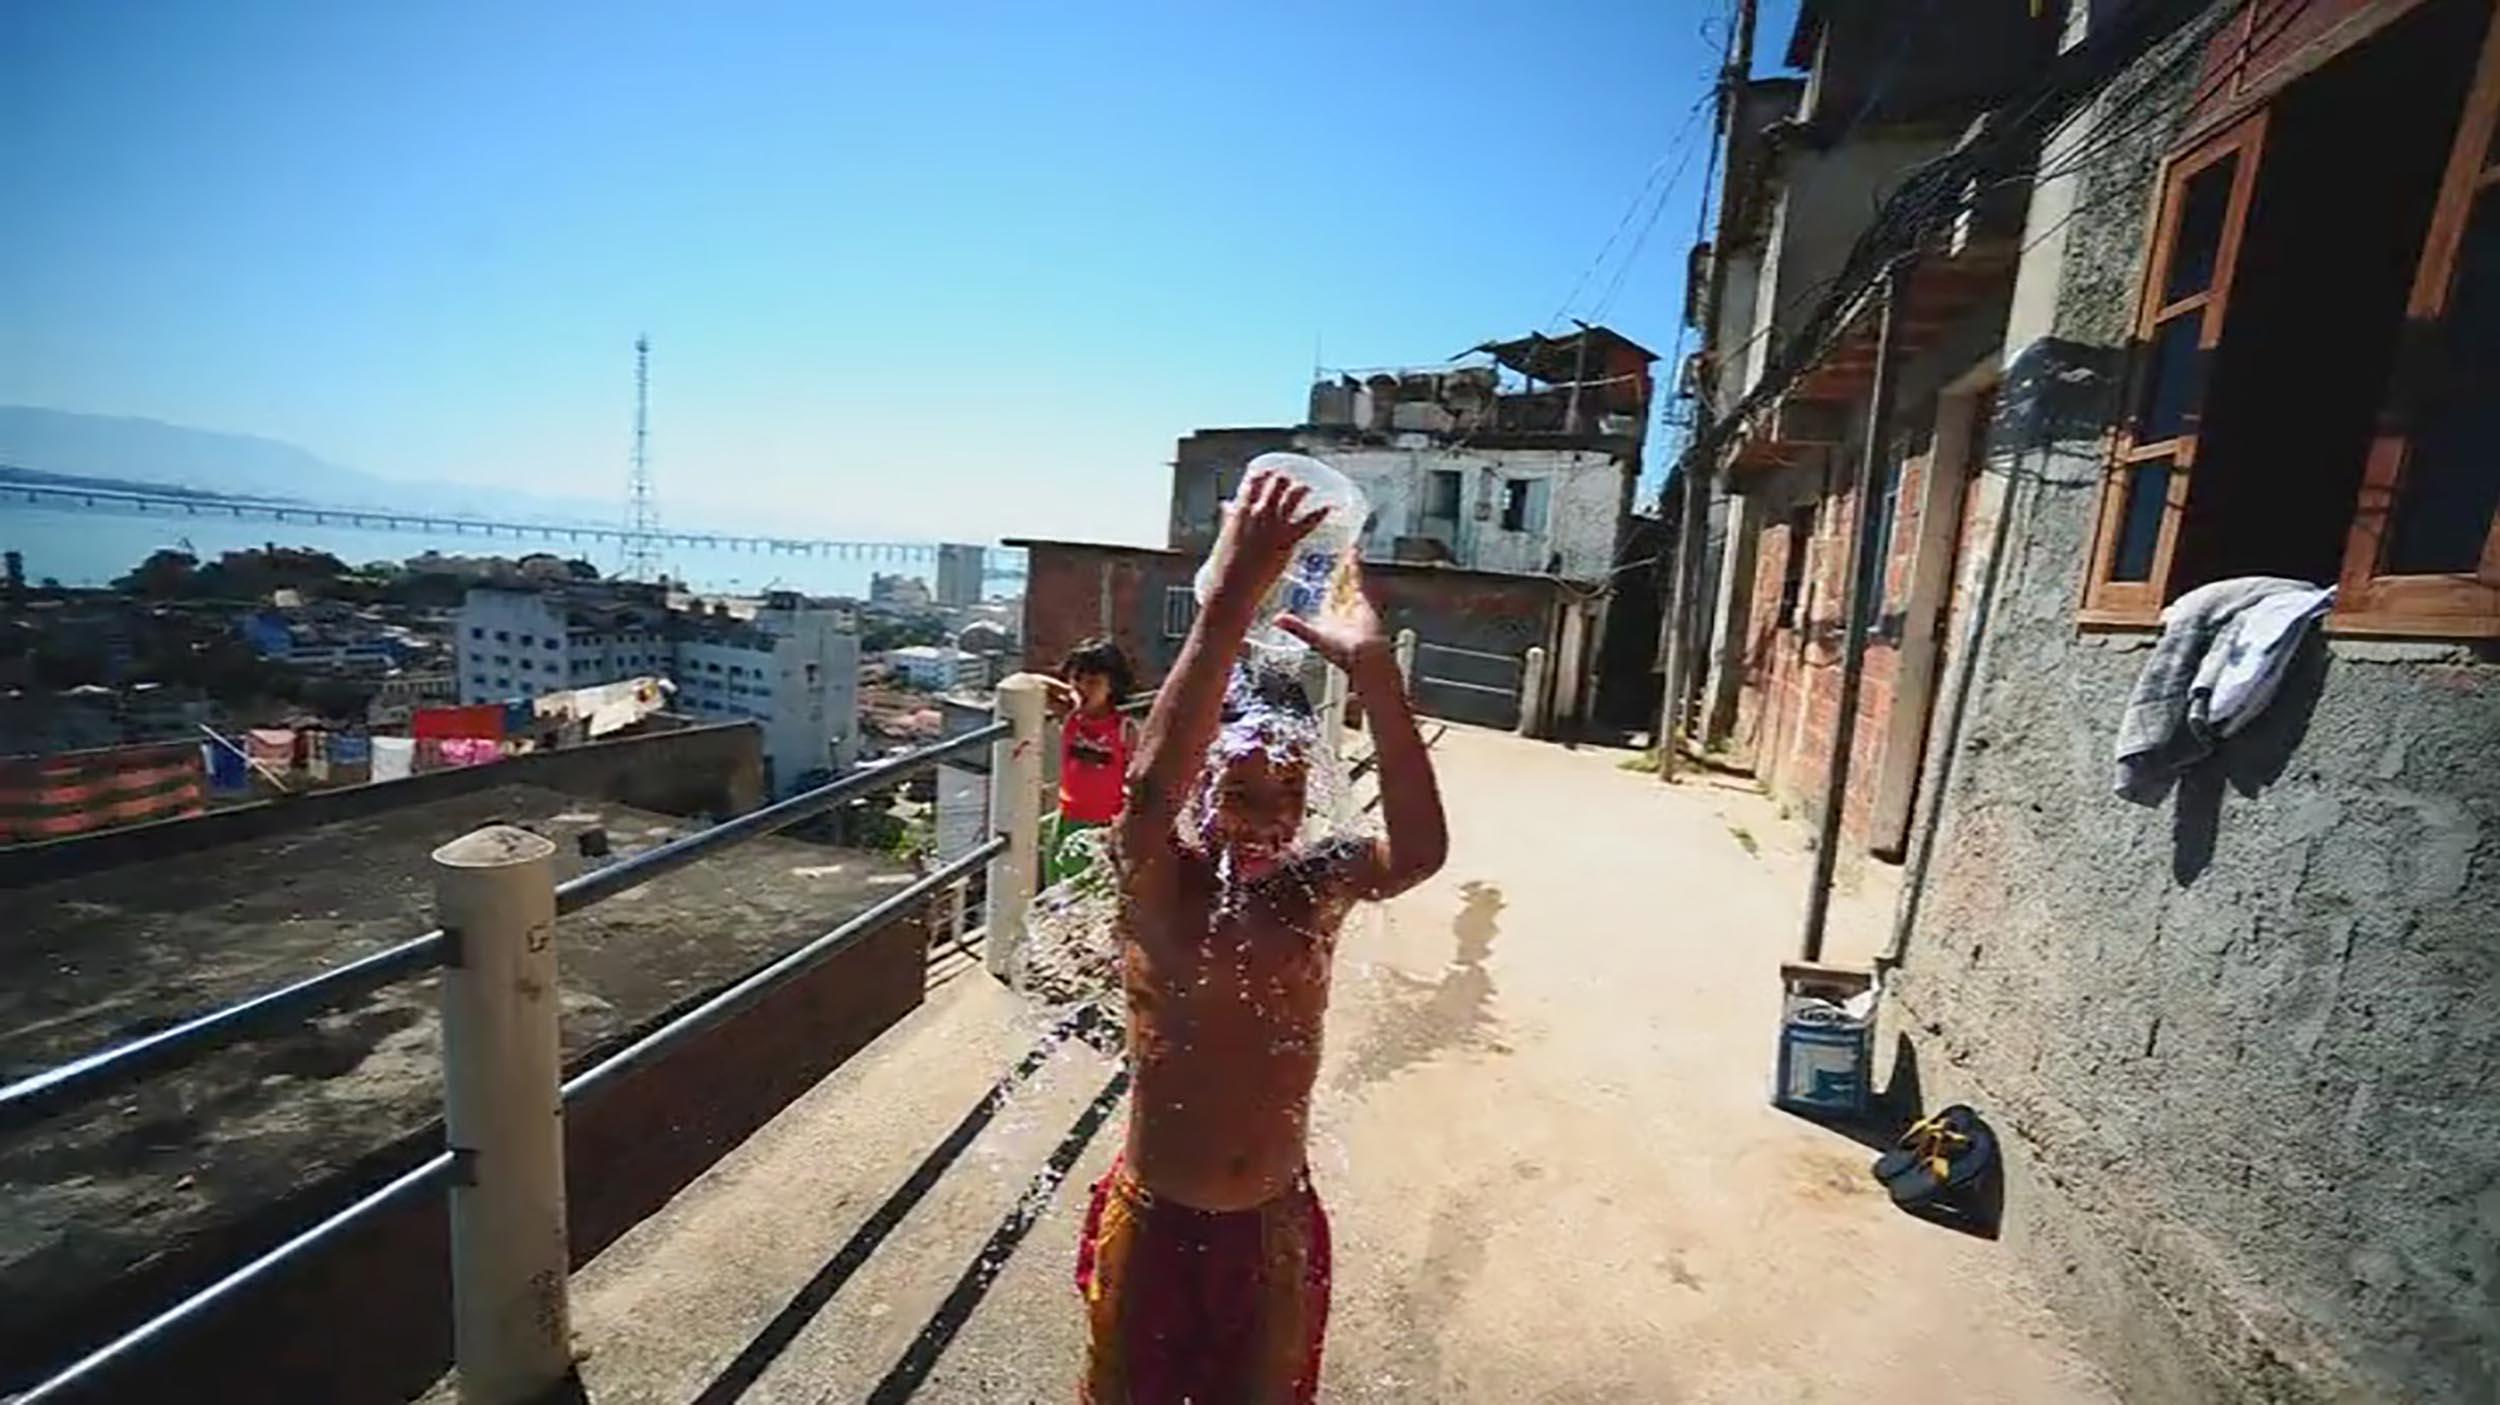 JR 'Women Are Heroes' Rio de Janeiro